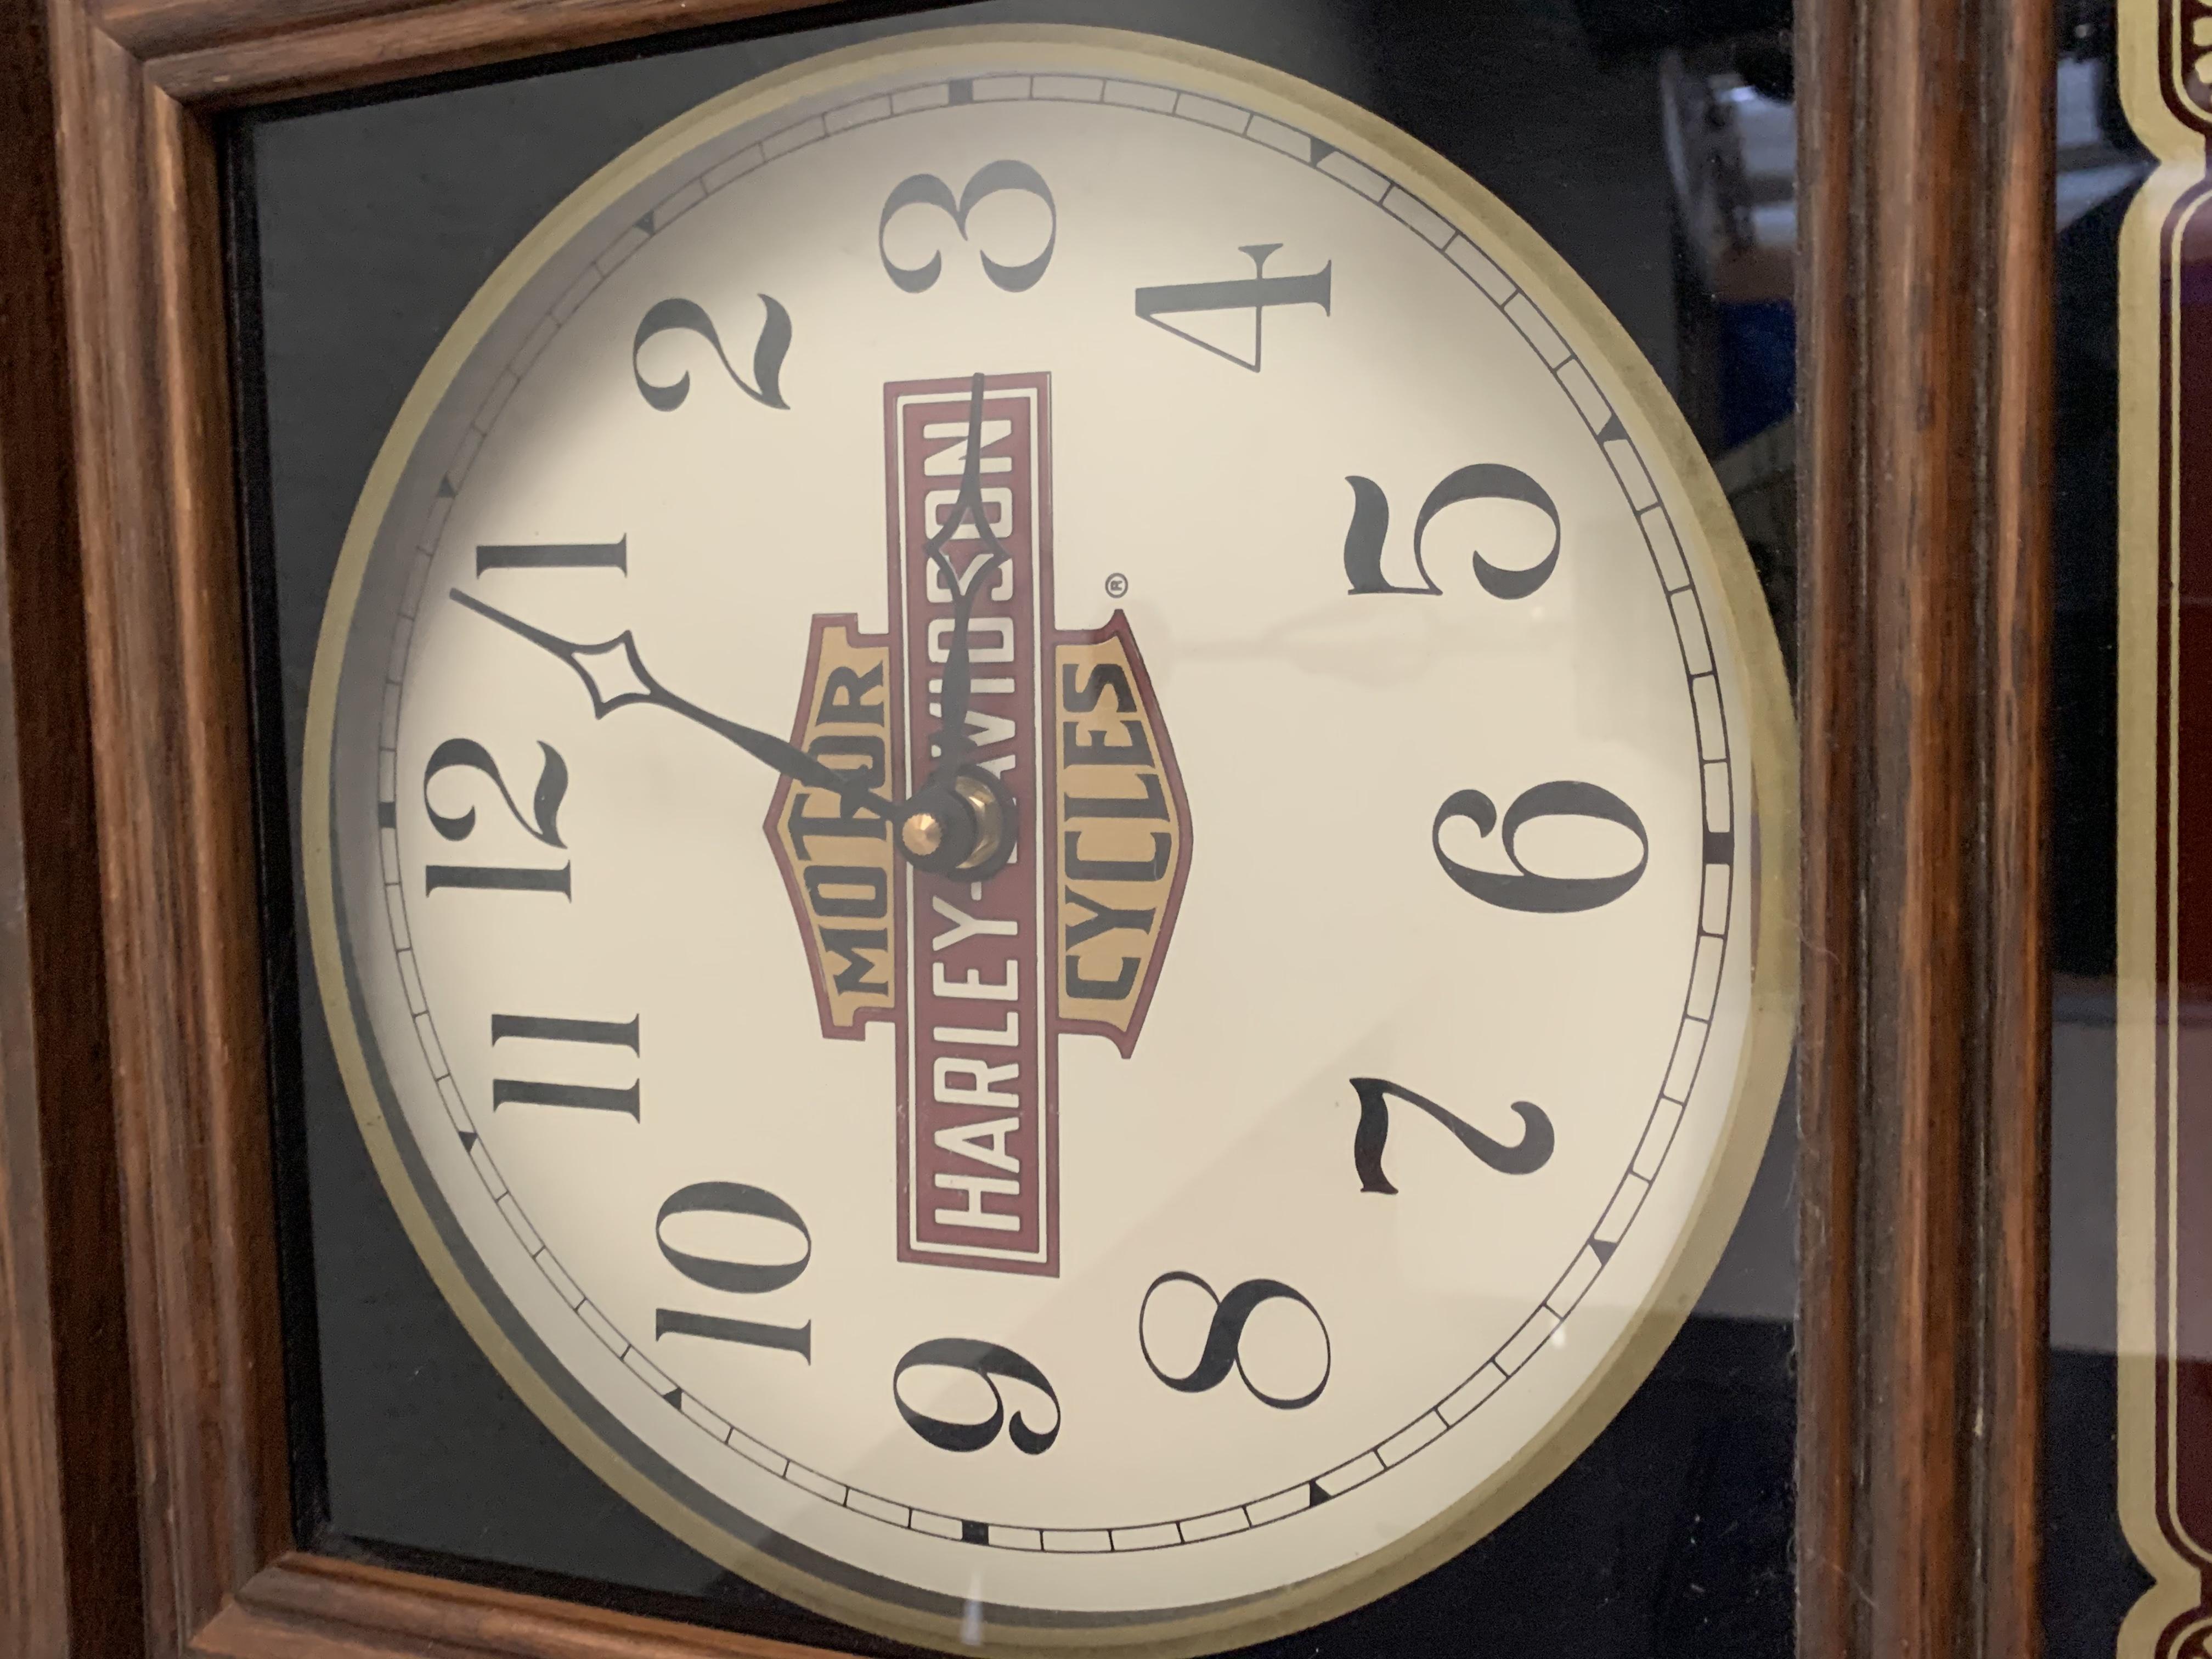 Harley-Davidson 1987 School house clock